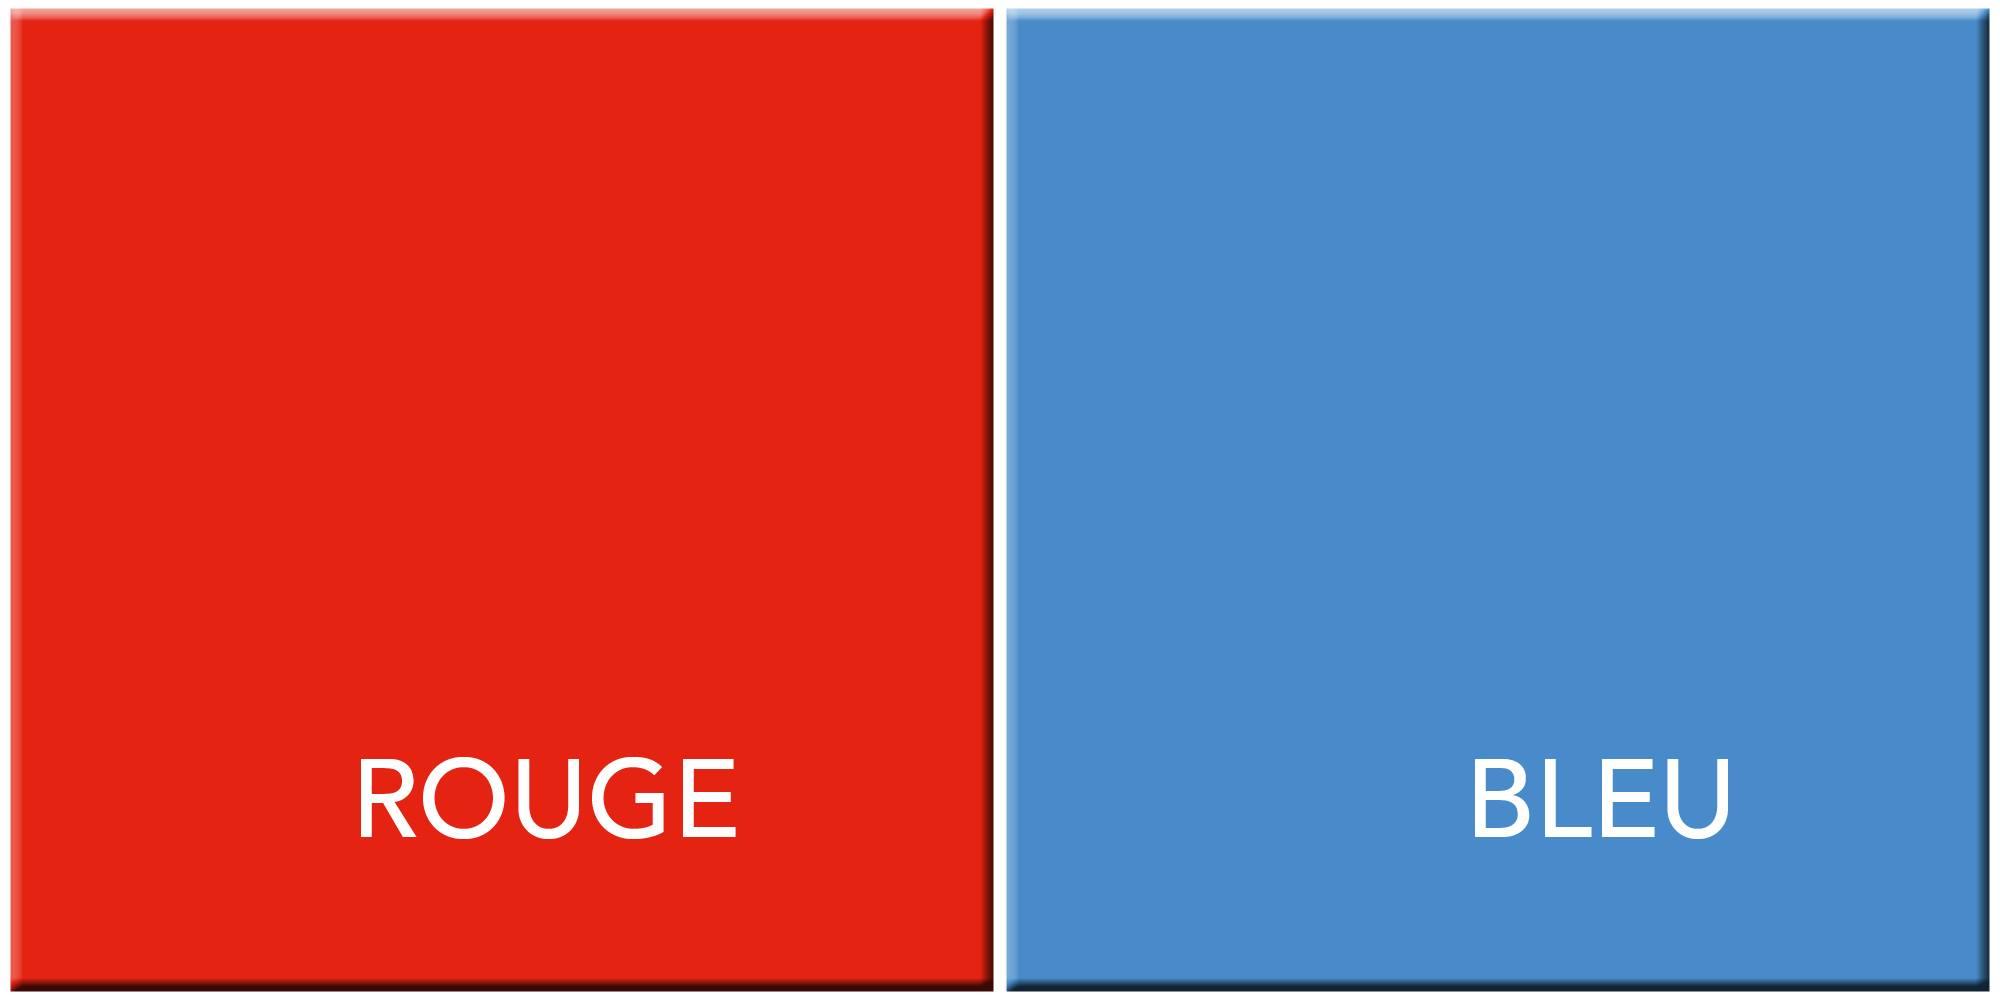 04-15-20 rouge-bleu